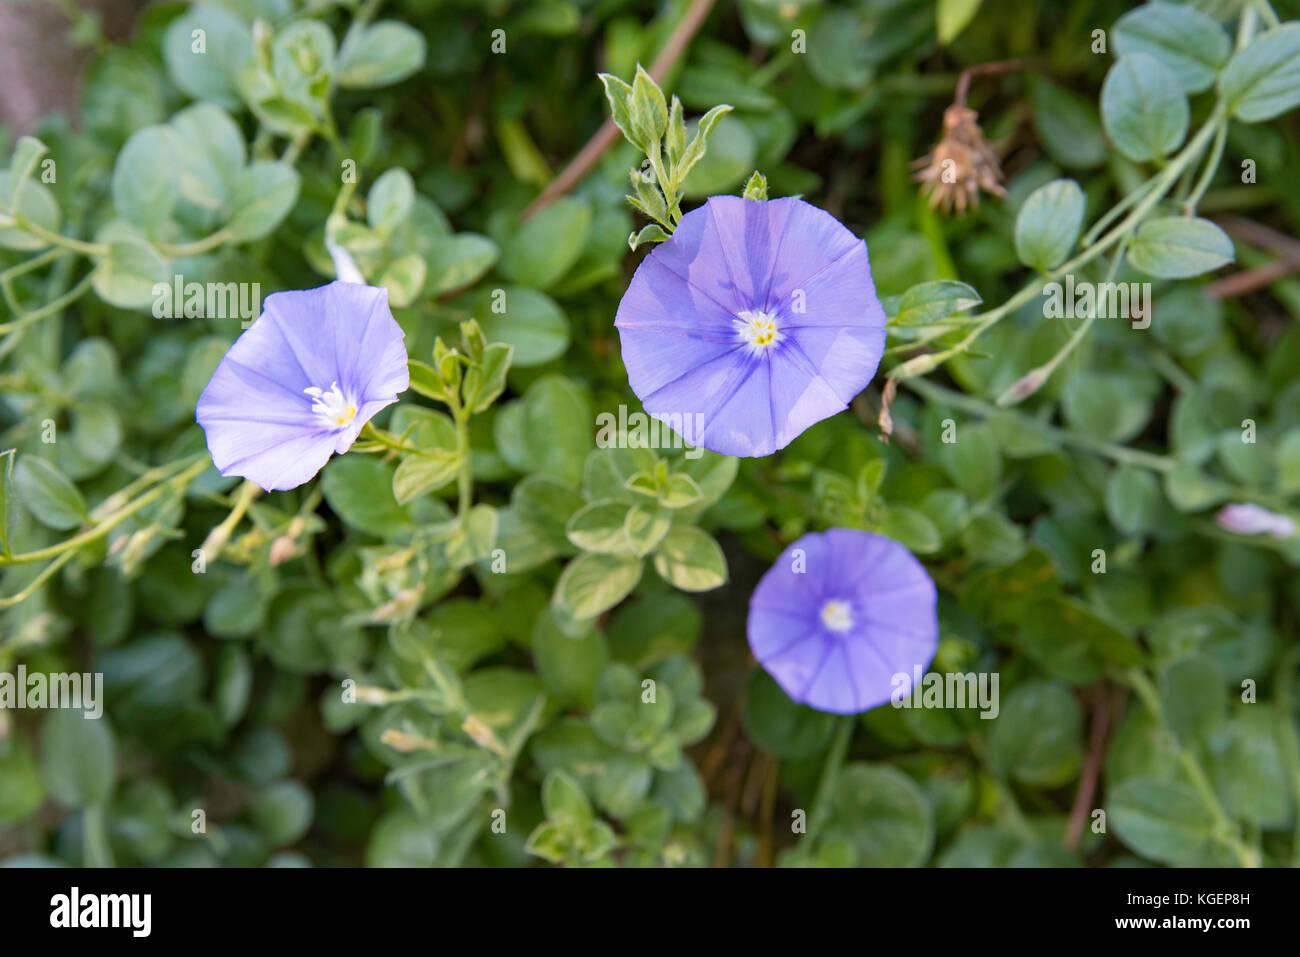 Blue flowering Convolvulus in a Sydney garden Stock Photo